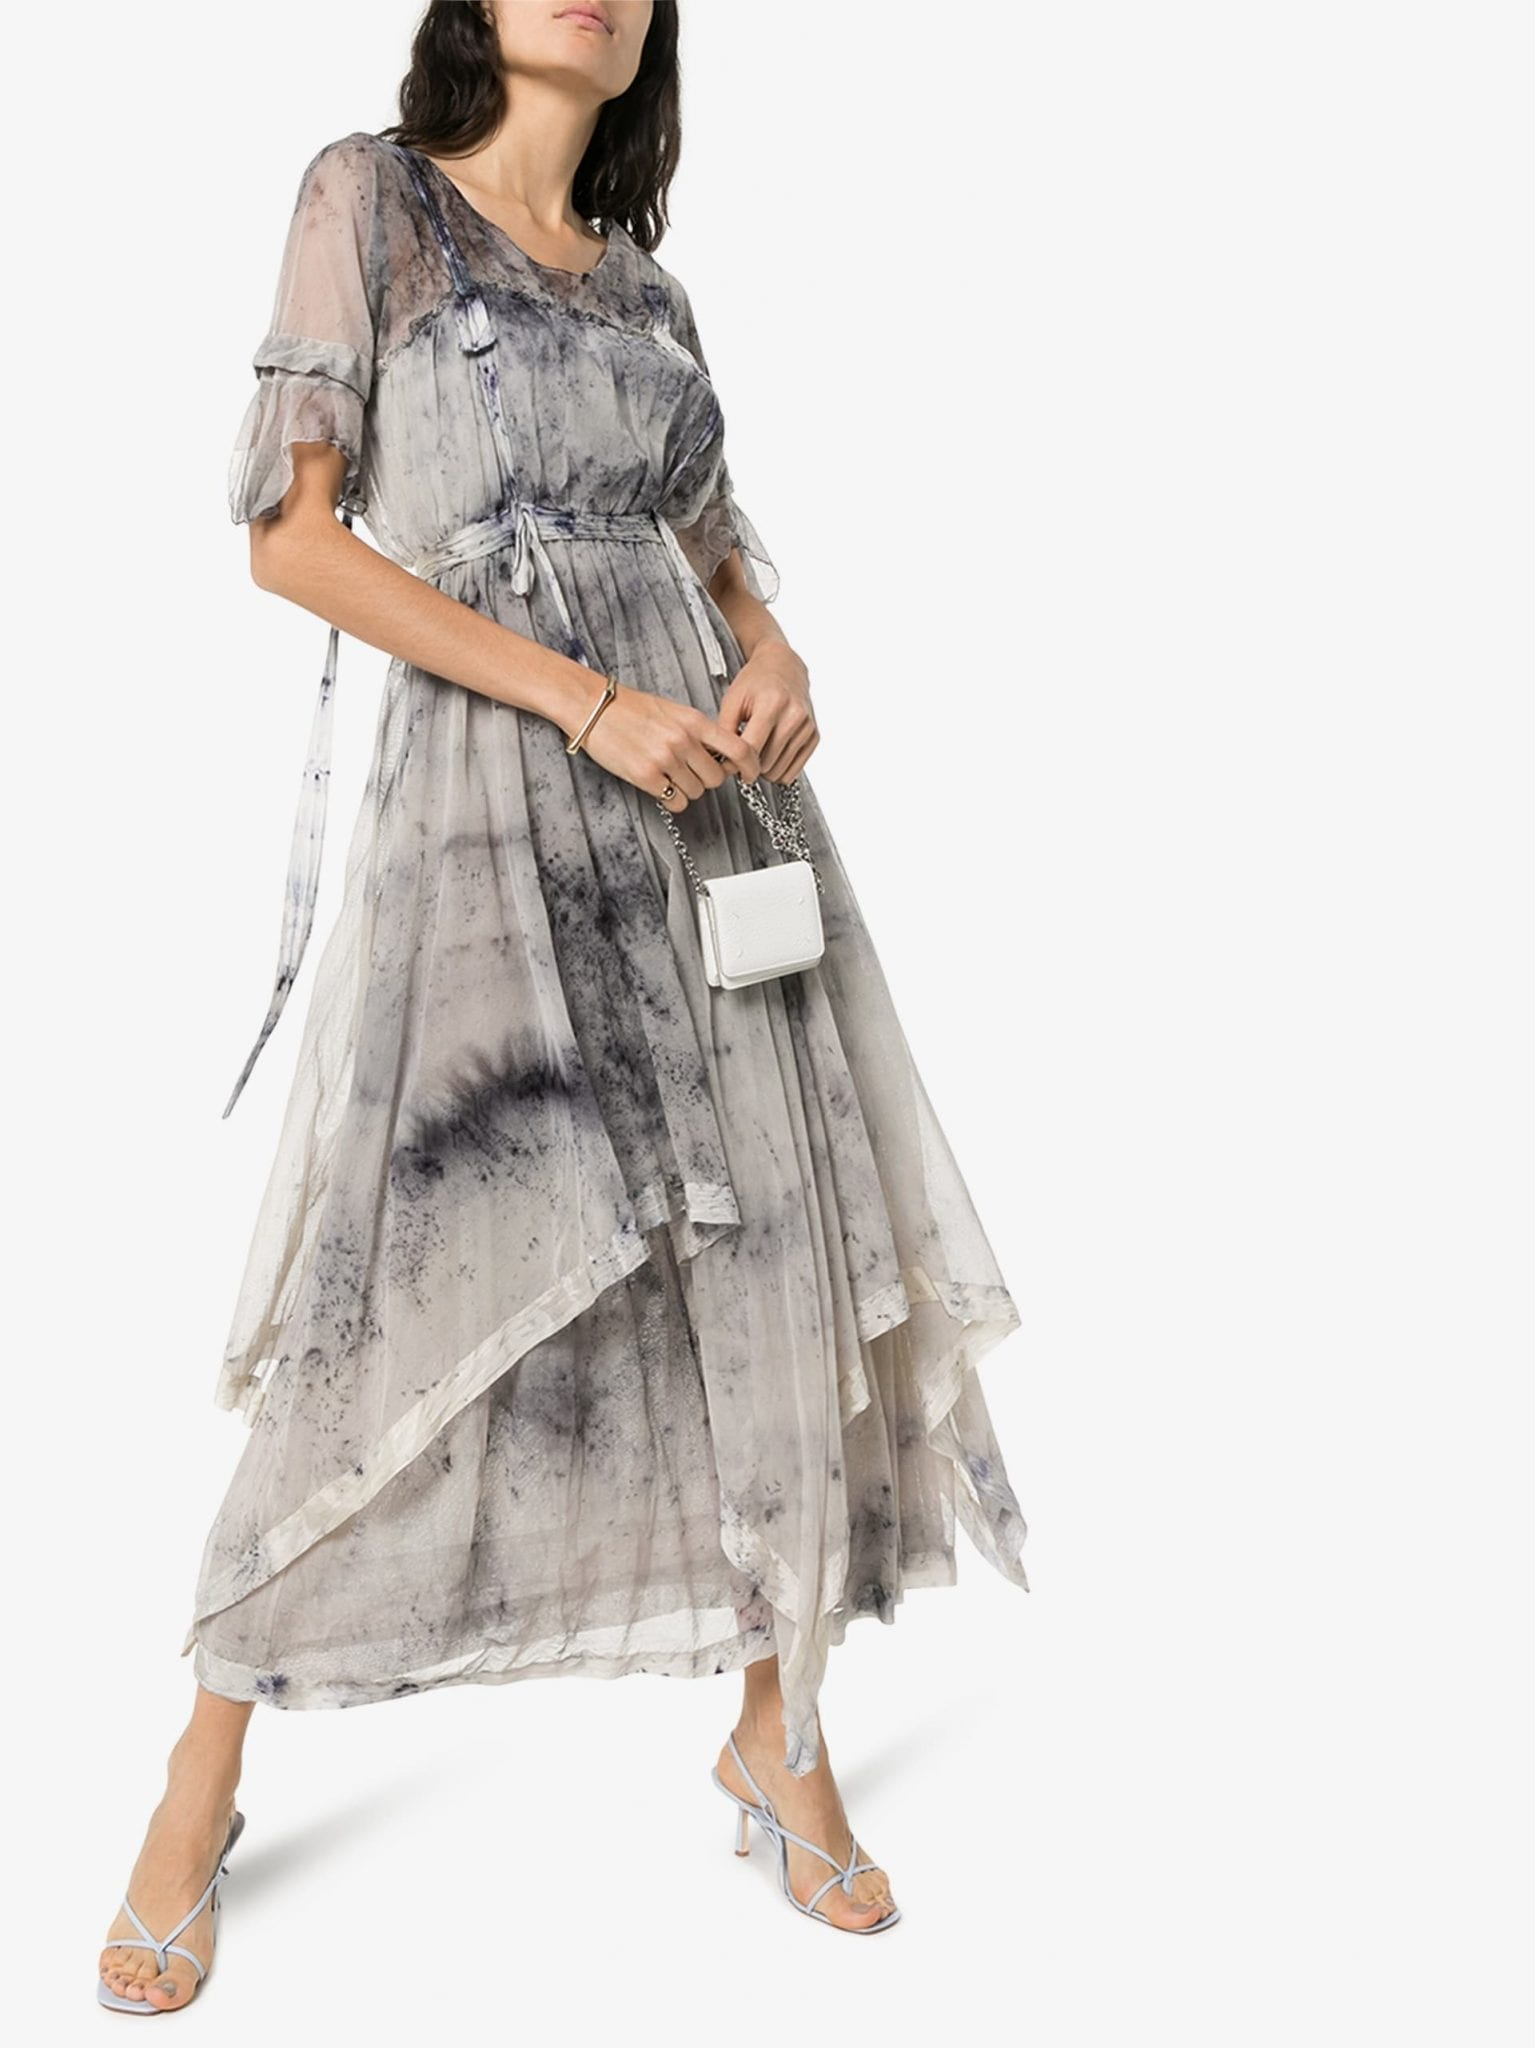 MIMI PROBER Susanna Tie-Dye Cotton Maxi Dress